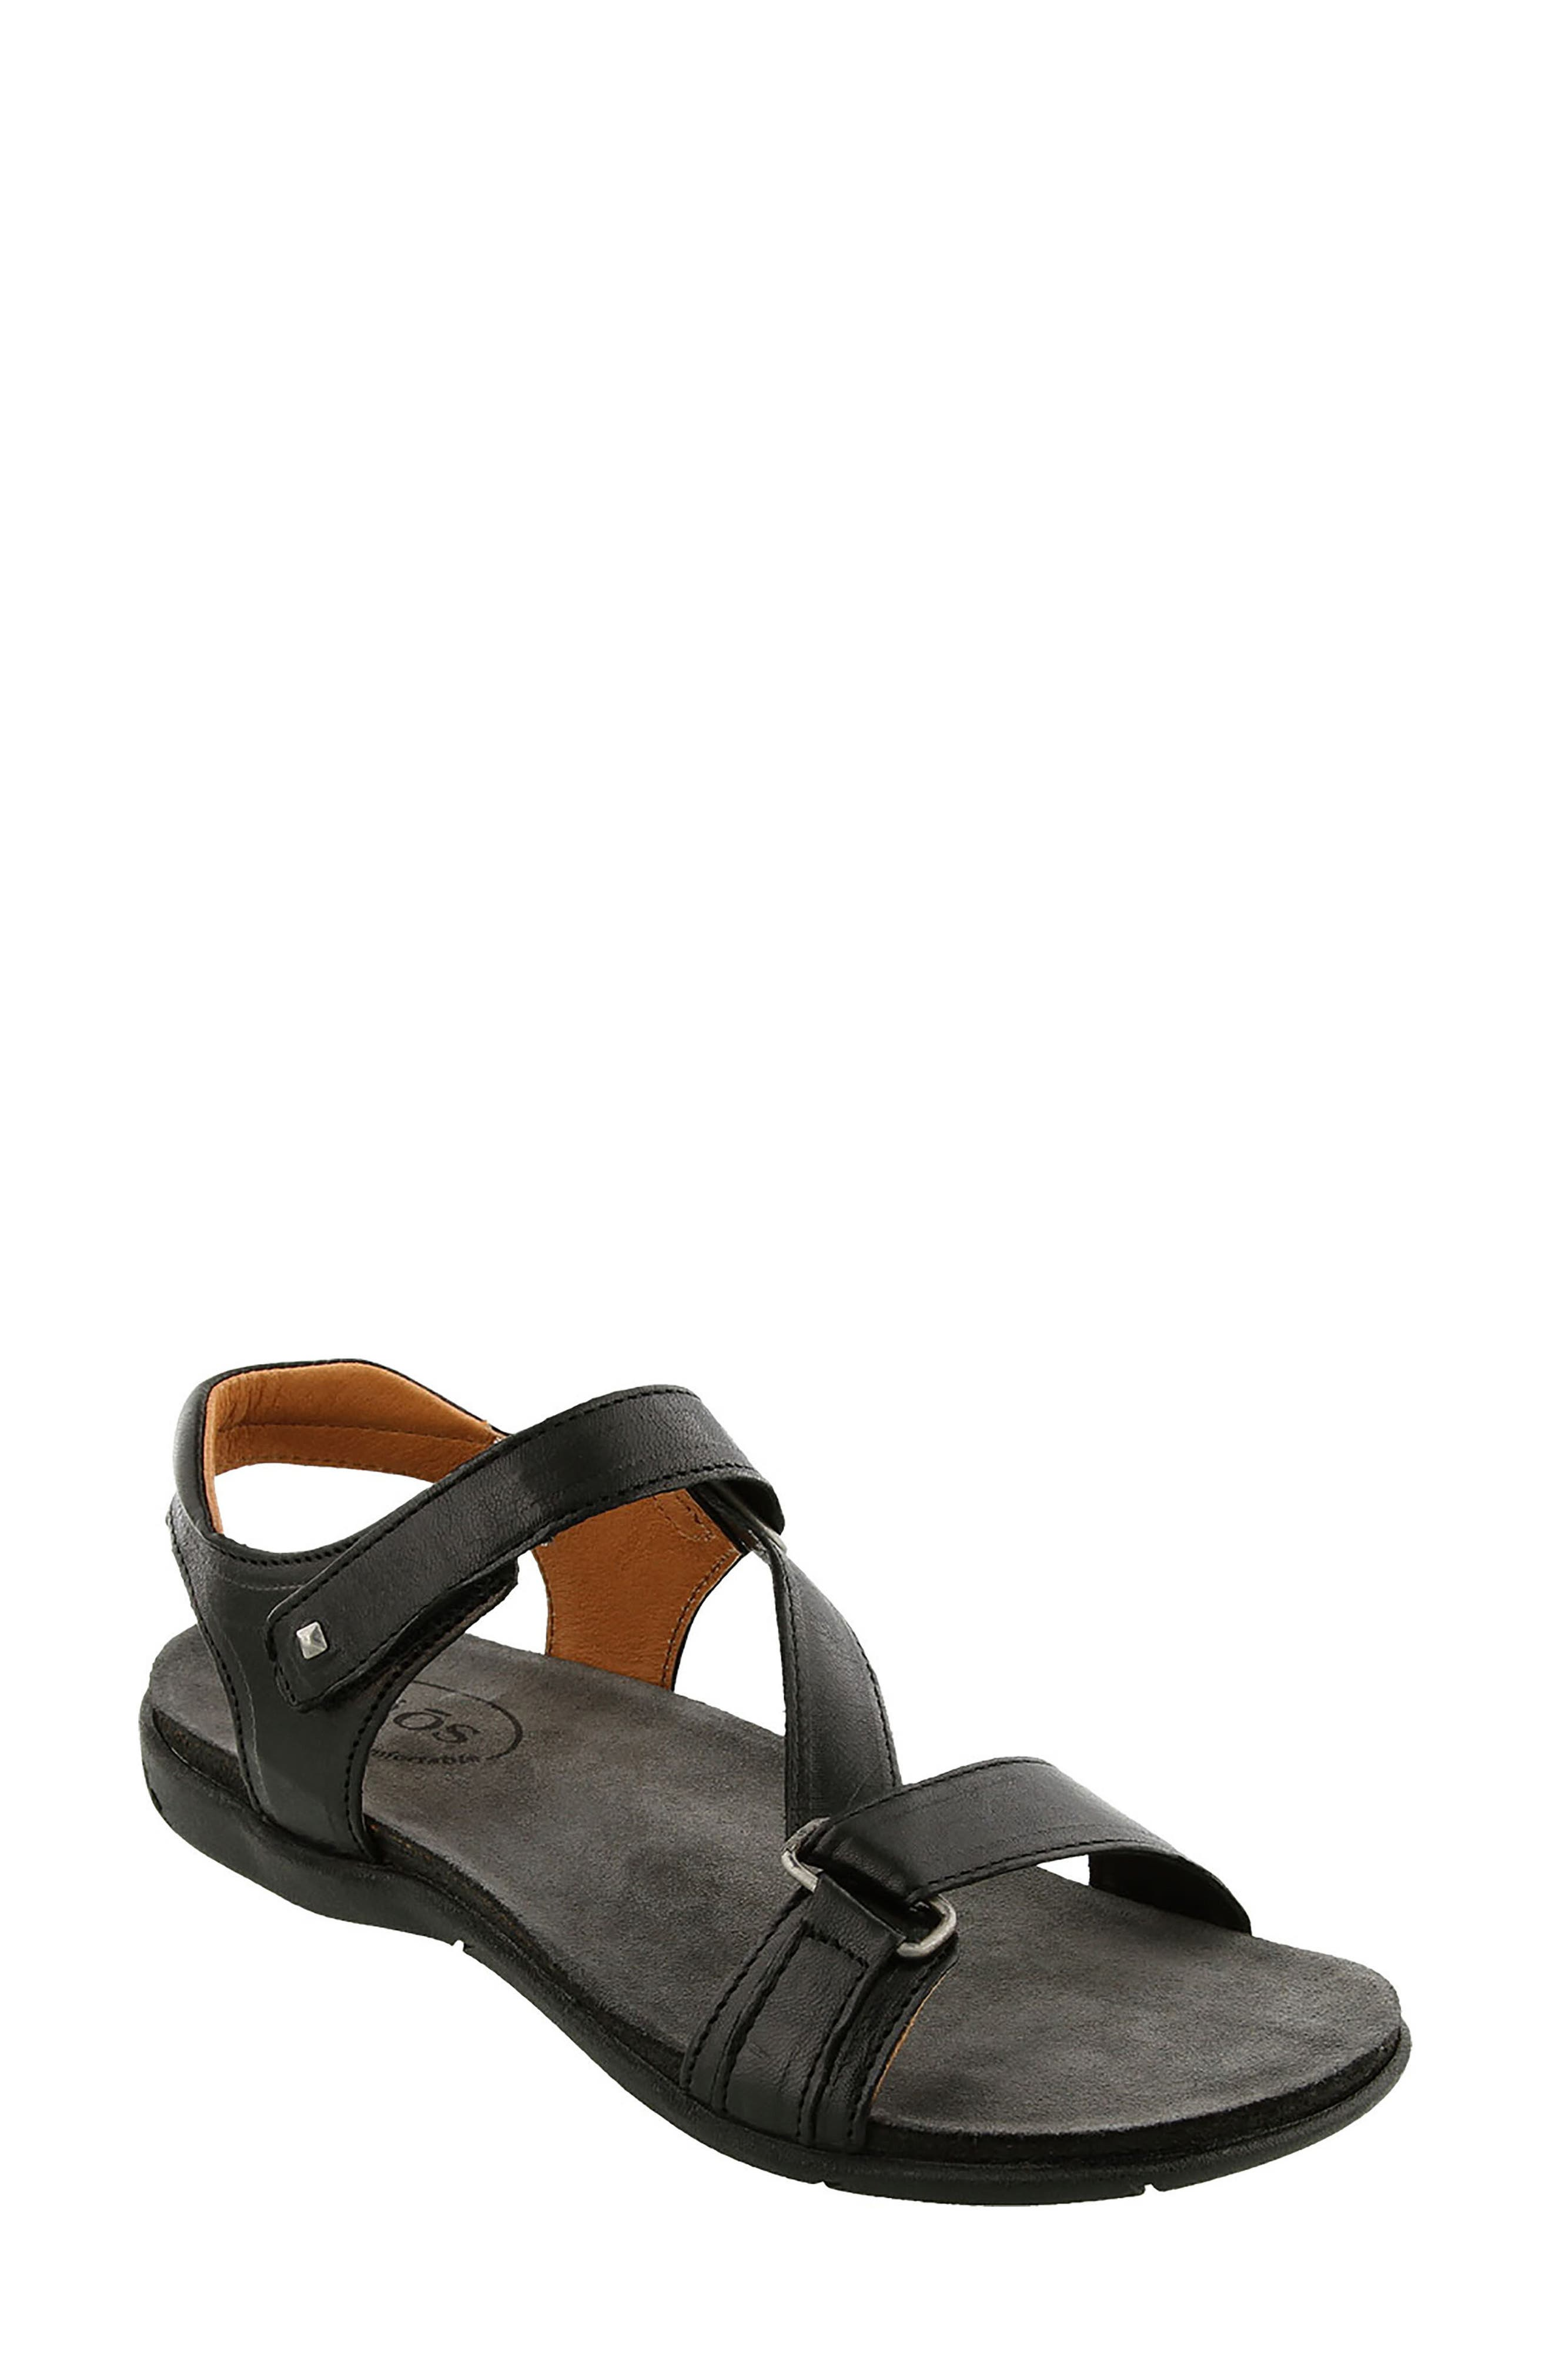 Zeal Sandal,                         Main,                         color, Black Leather